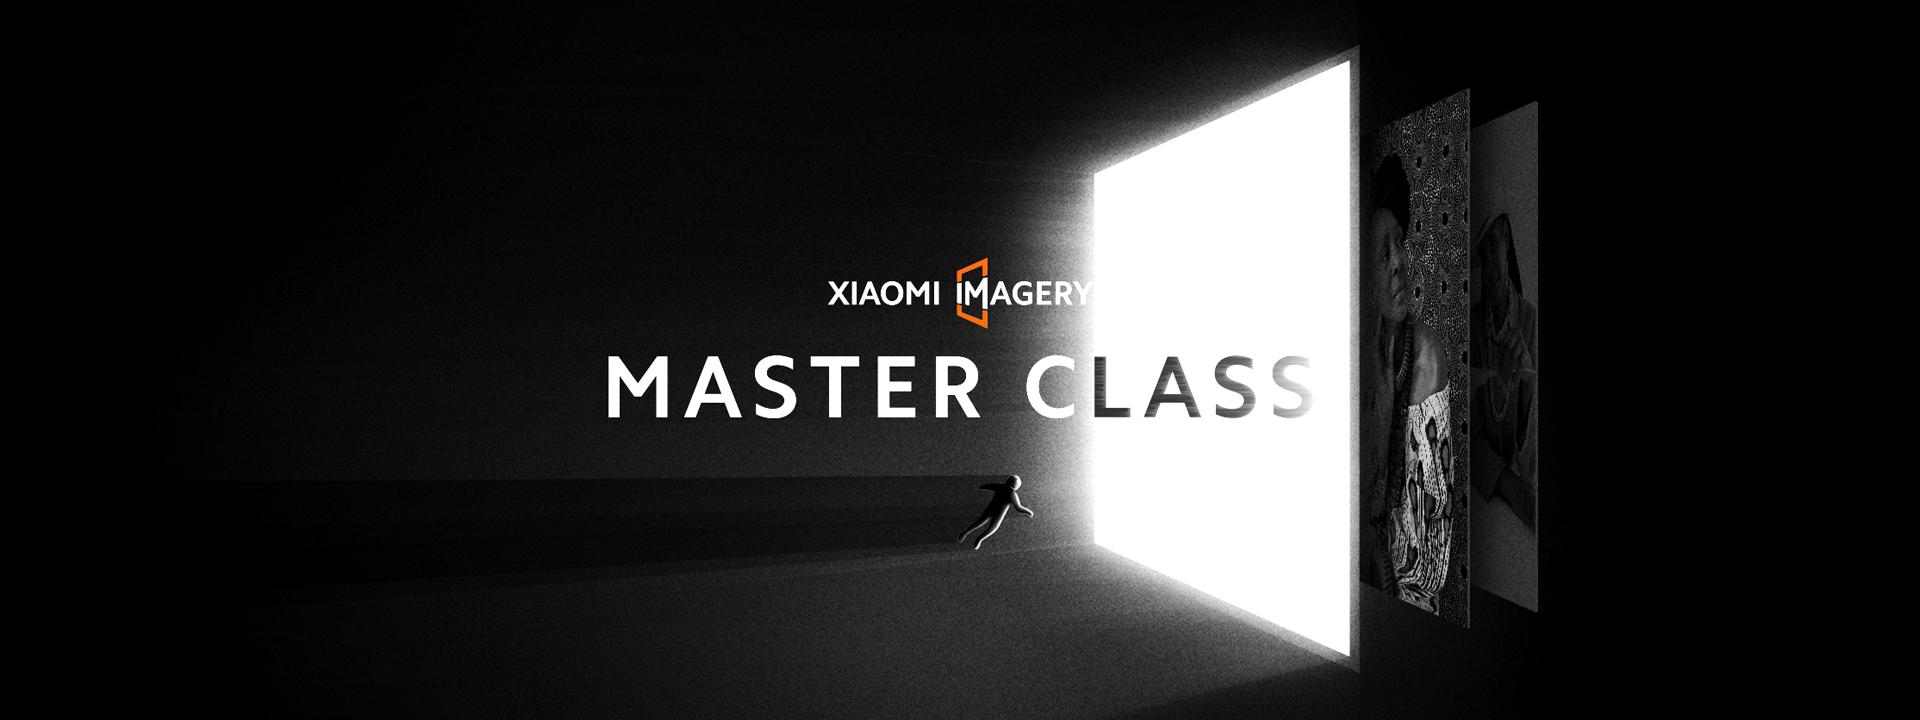 Xiaomi Imagery Master Class